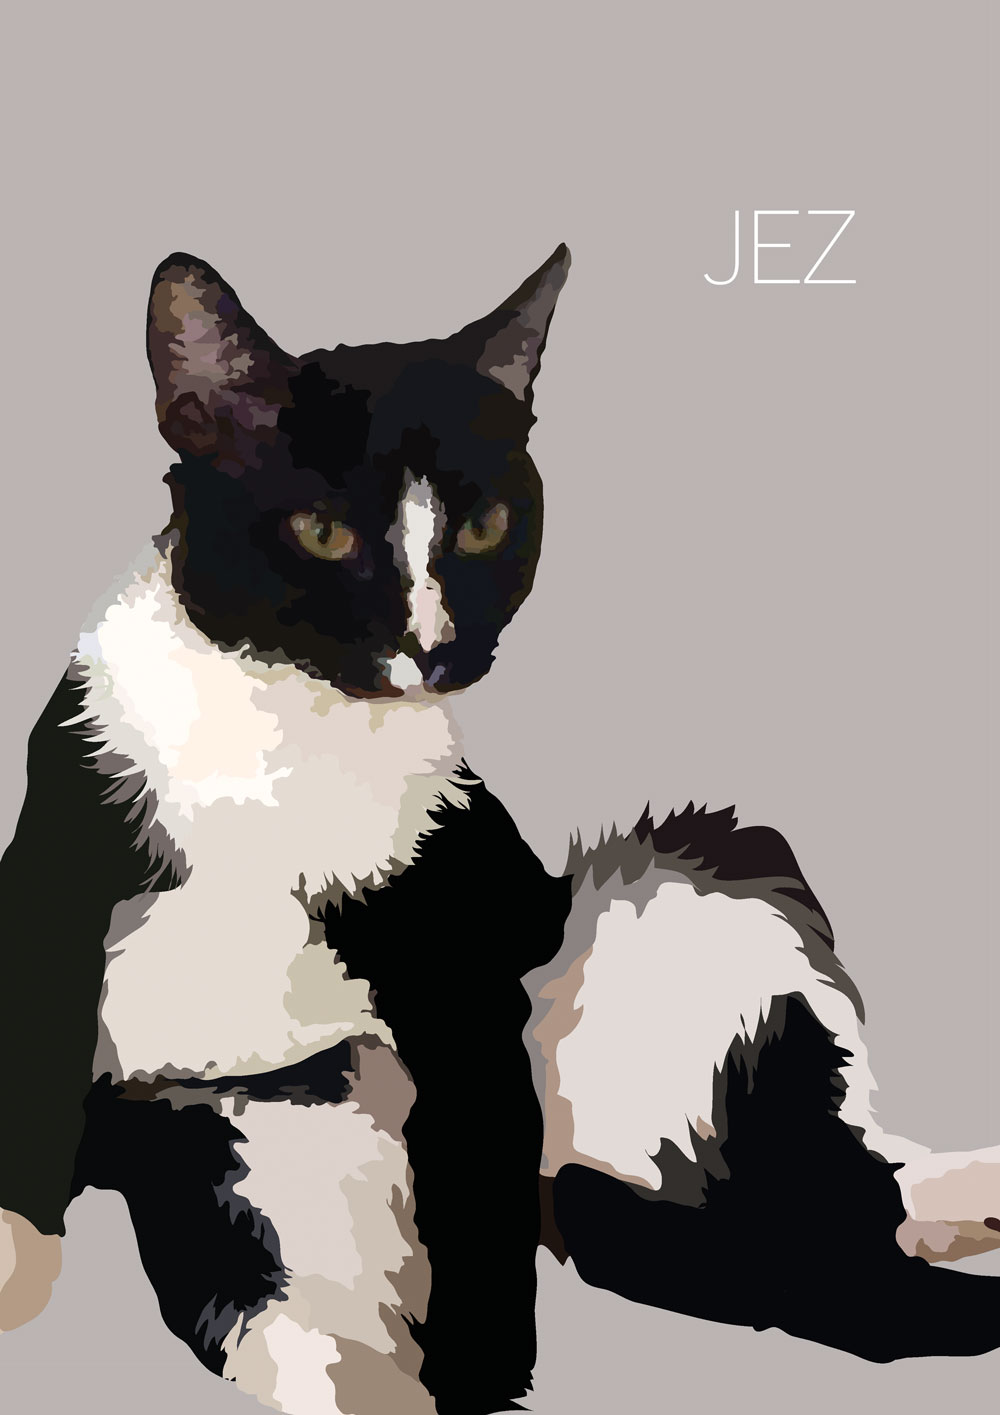 Jezweb